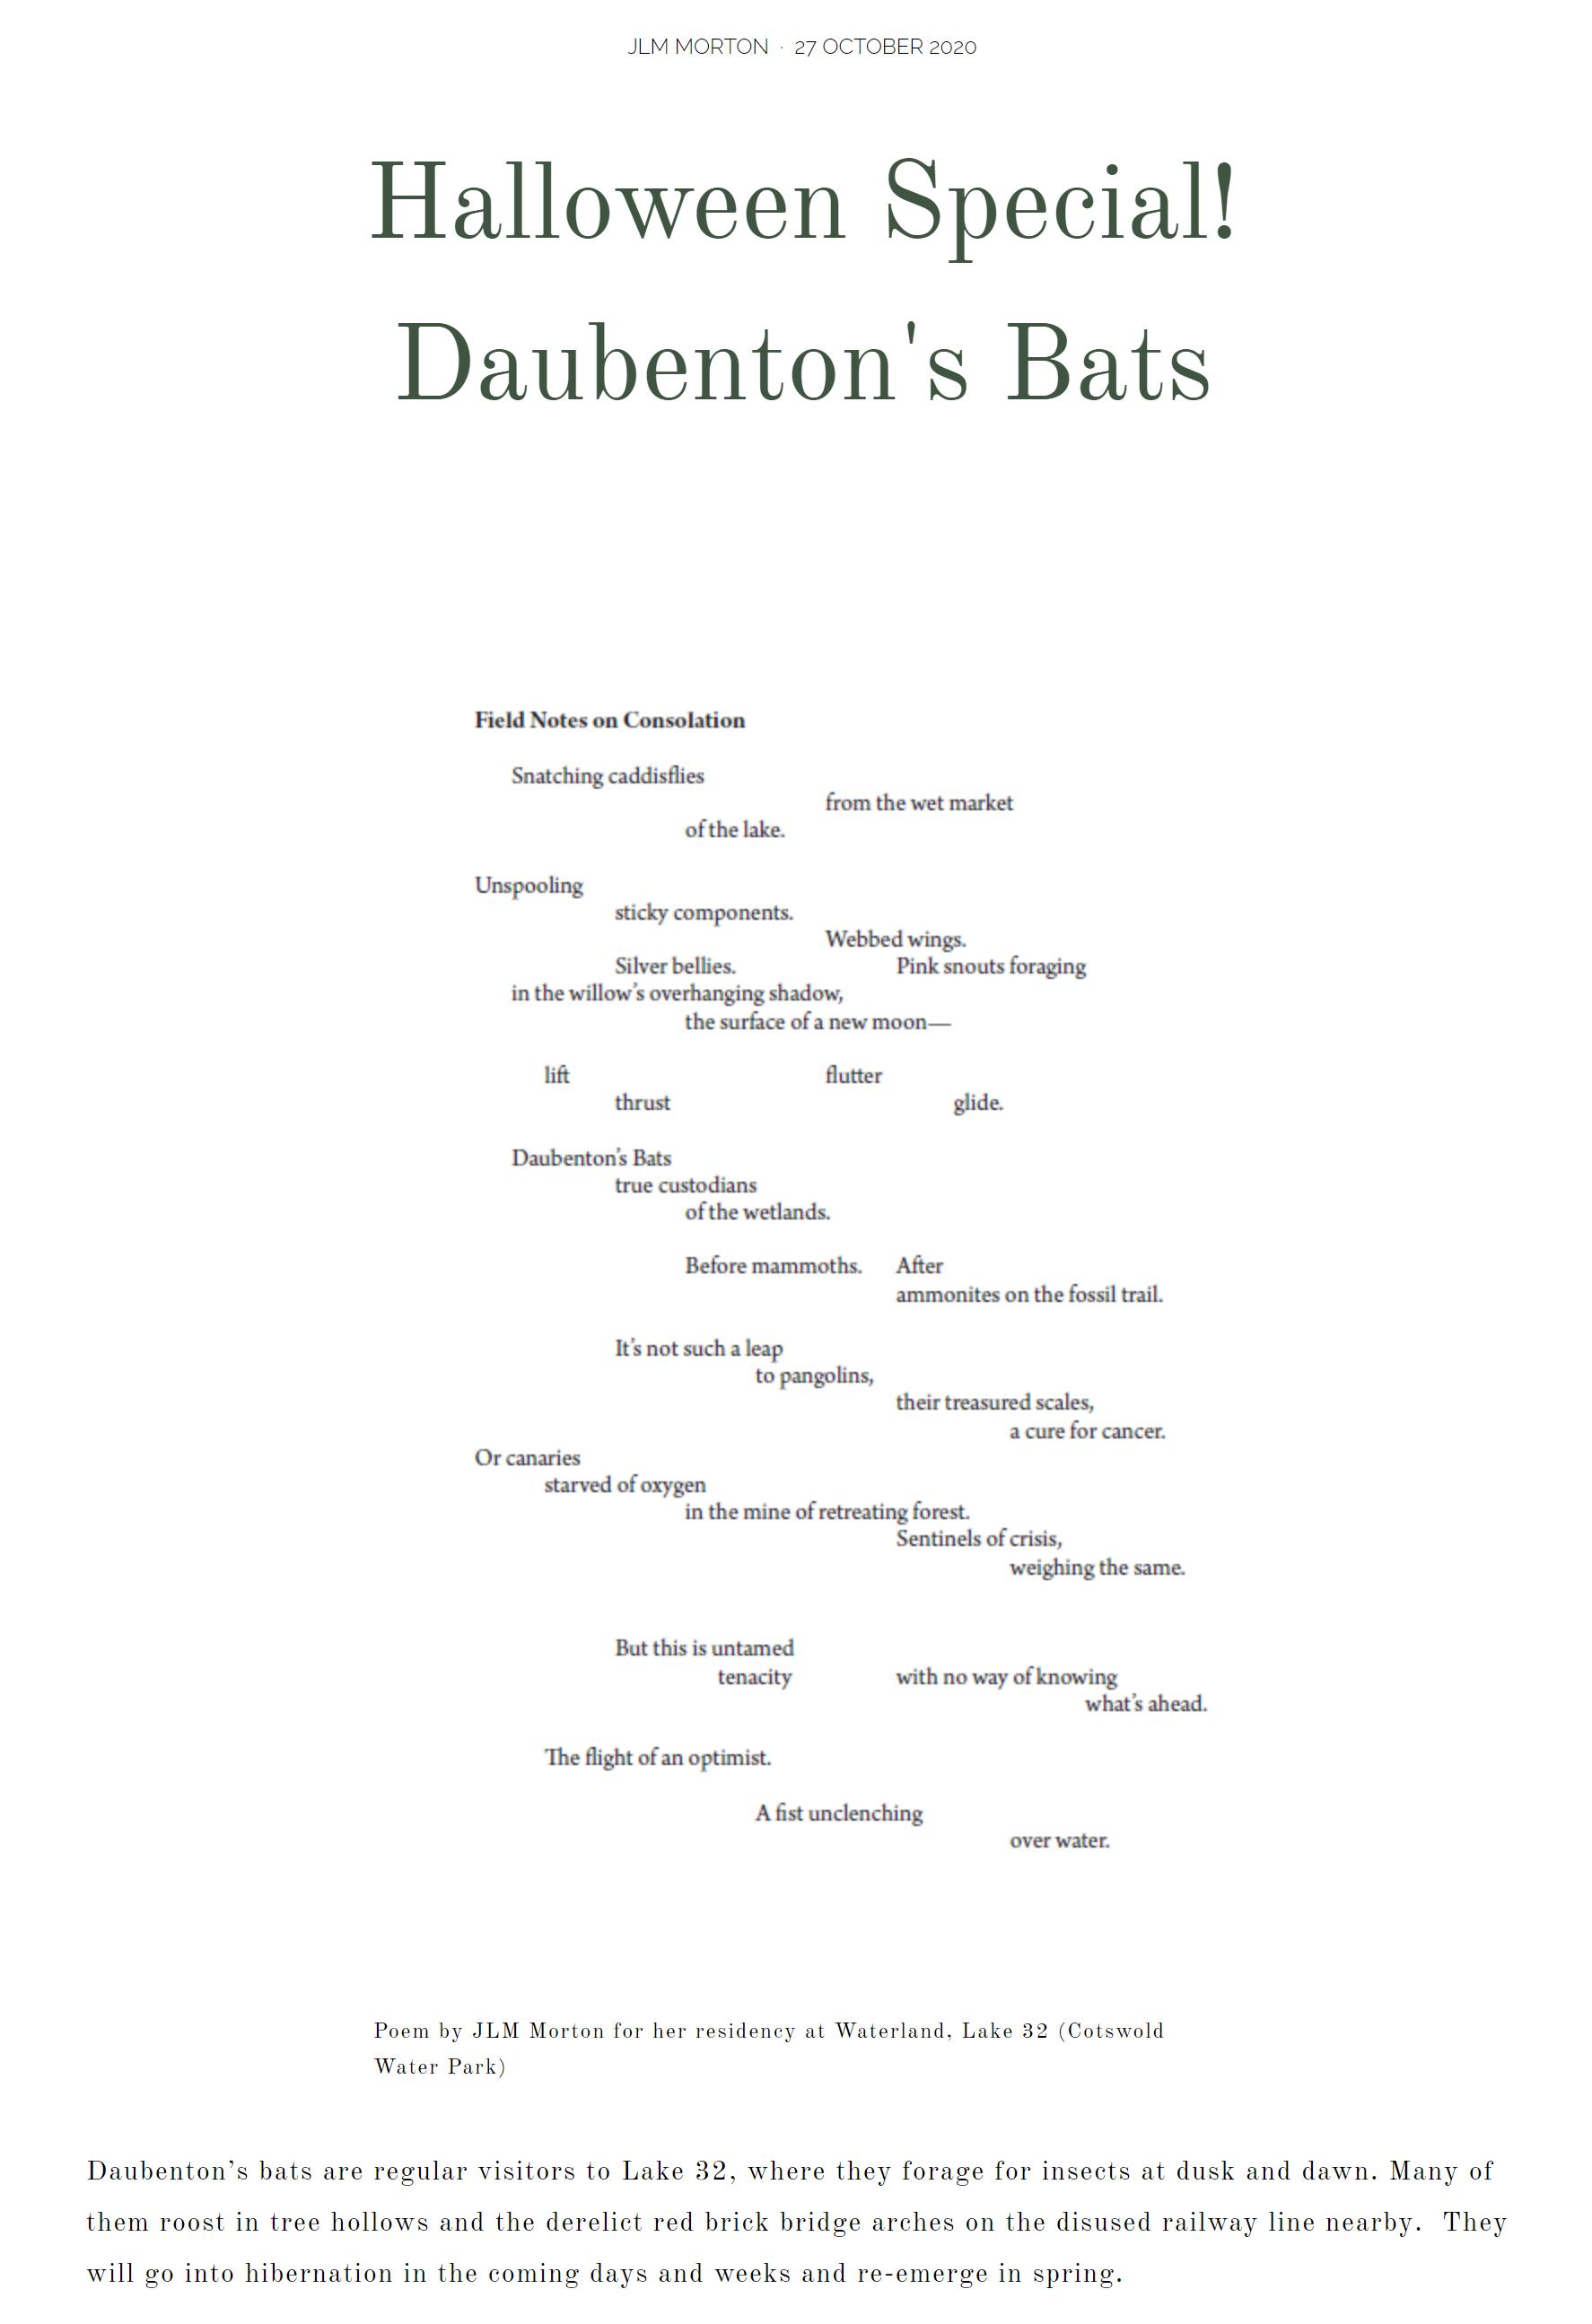 Daubenton's Bats by JLM Morton